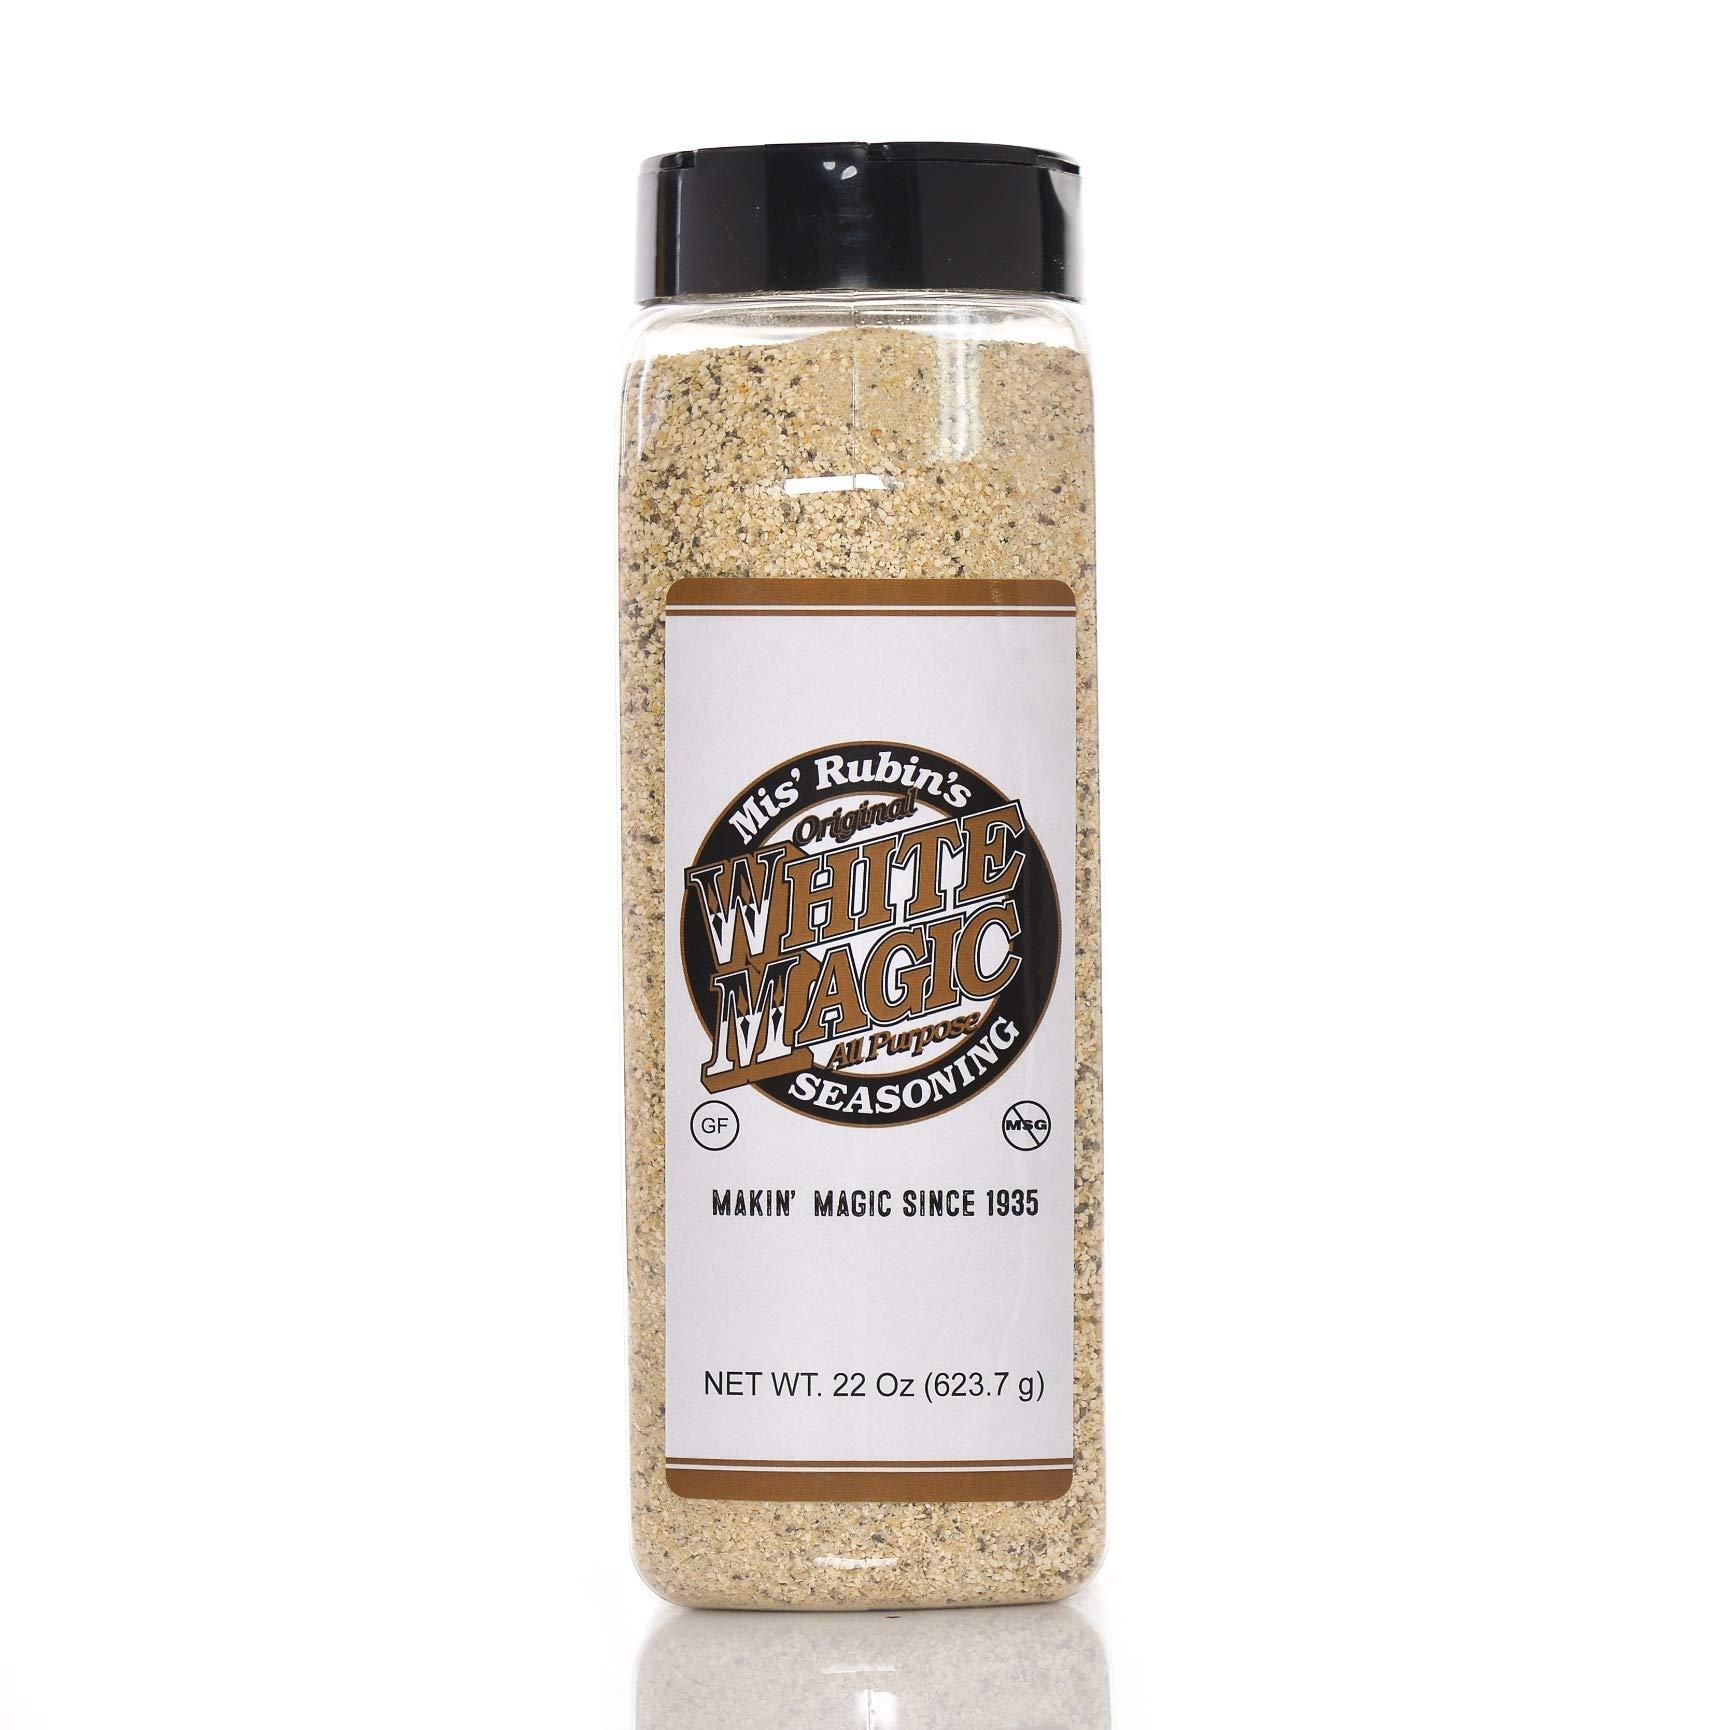 Gourmet All-Purpose Seasoning (Large) - 22 oz. Original White Magic Dry Rub Spice Powder Best Served on Seafood, Vegetables, Grilled Chicken, Boneless Pork Chops, and Popcorn